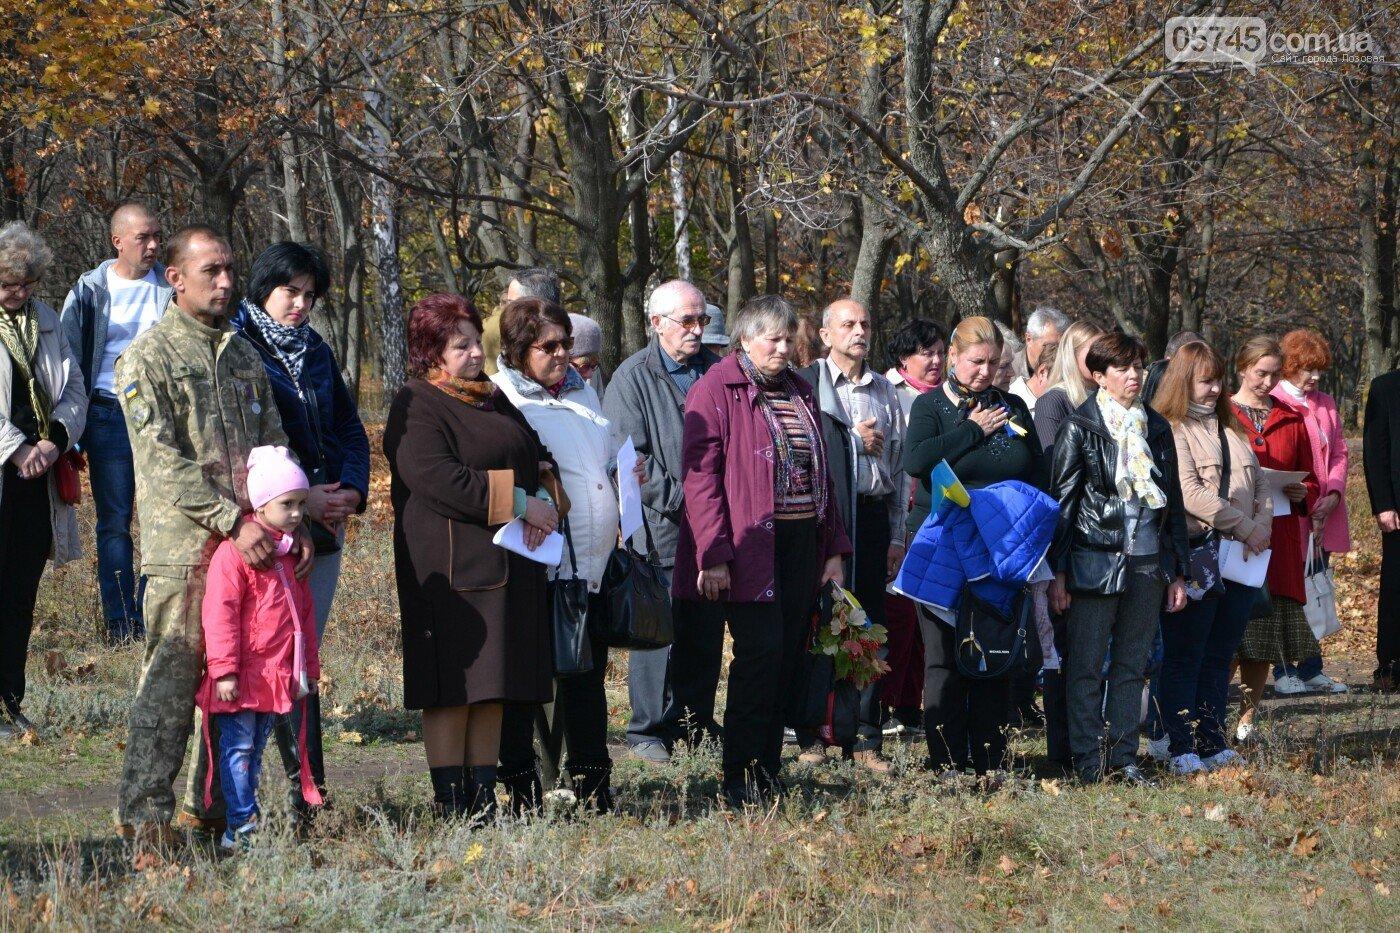 Без масок и карантина: как Лозовщина праздновала День защитника Украины год назад (ФОТО), фото-34